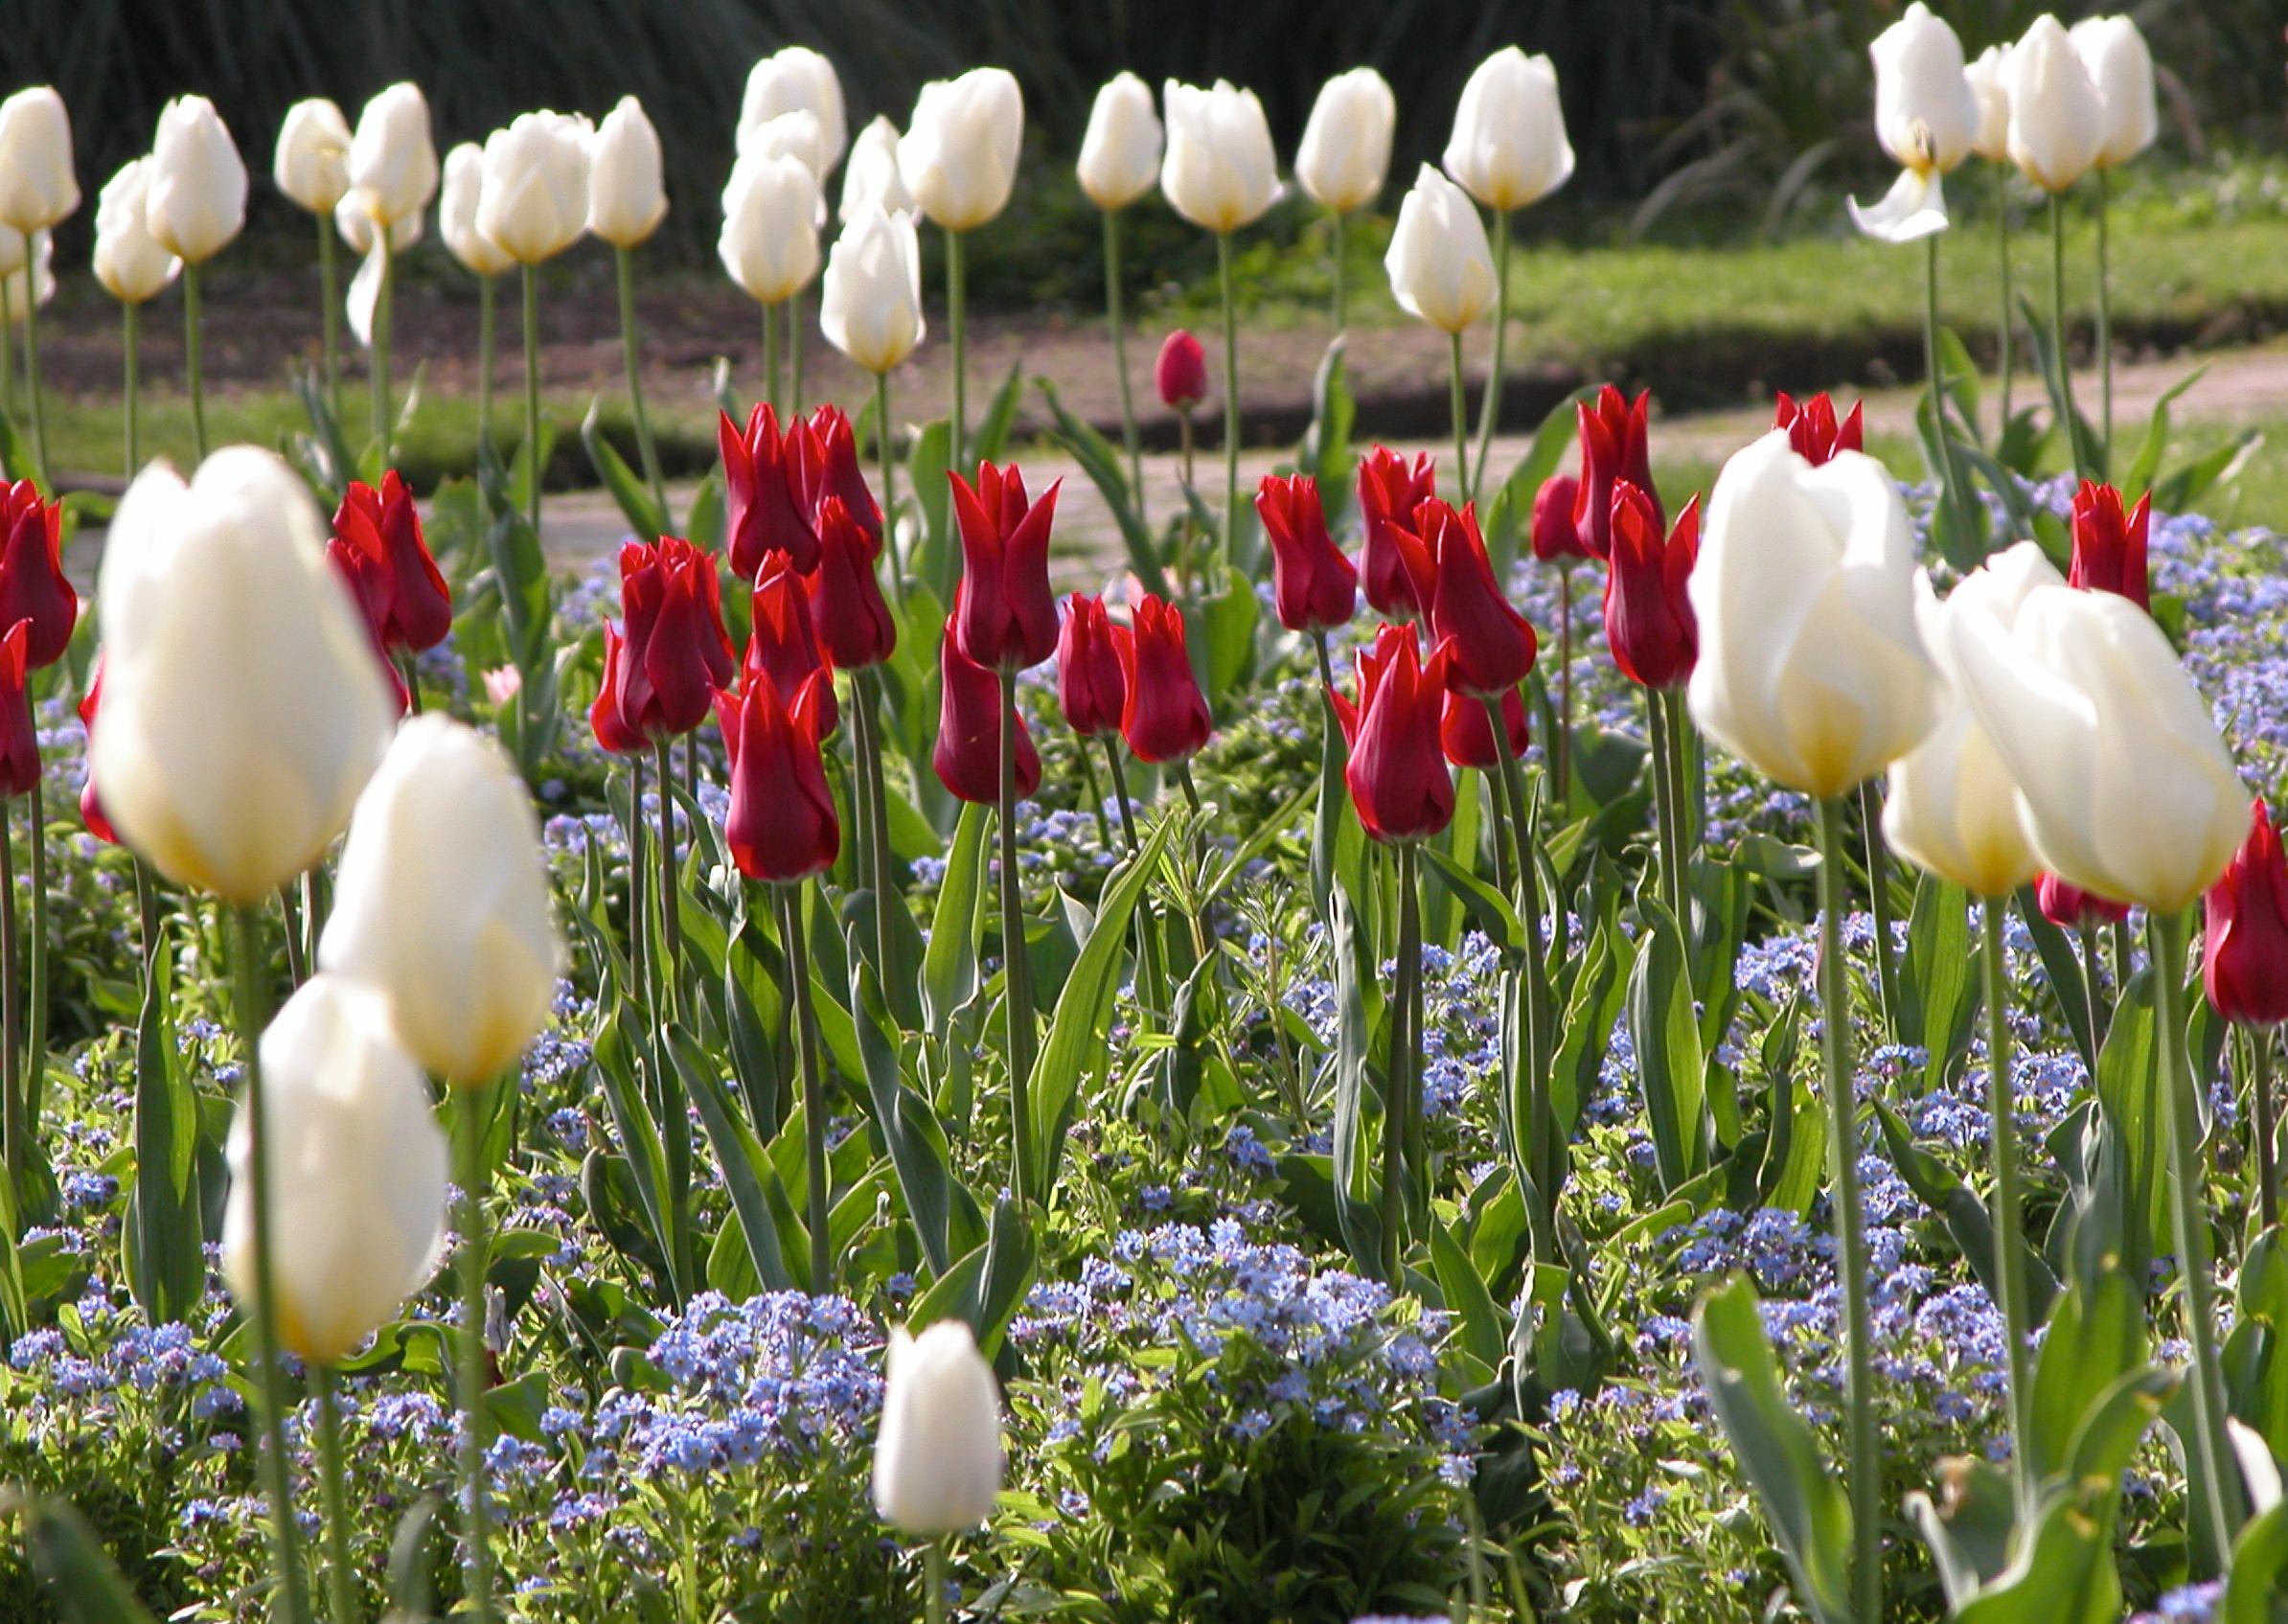 springtime in the flower garden